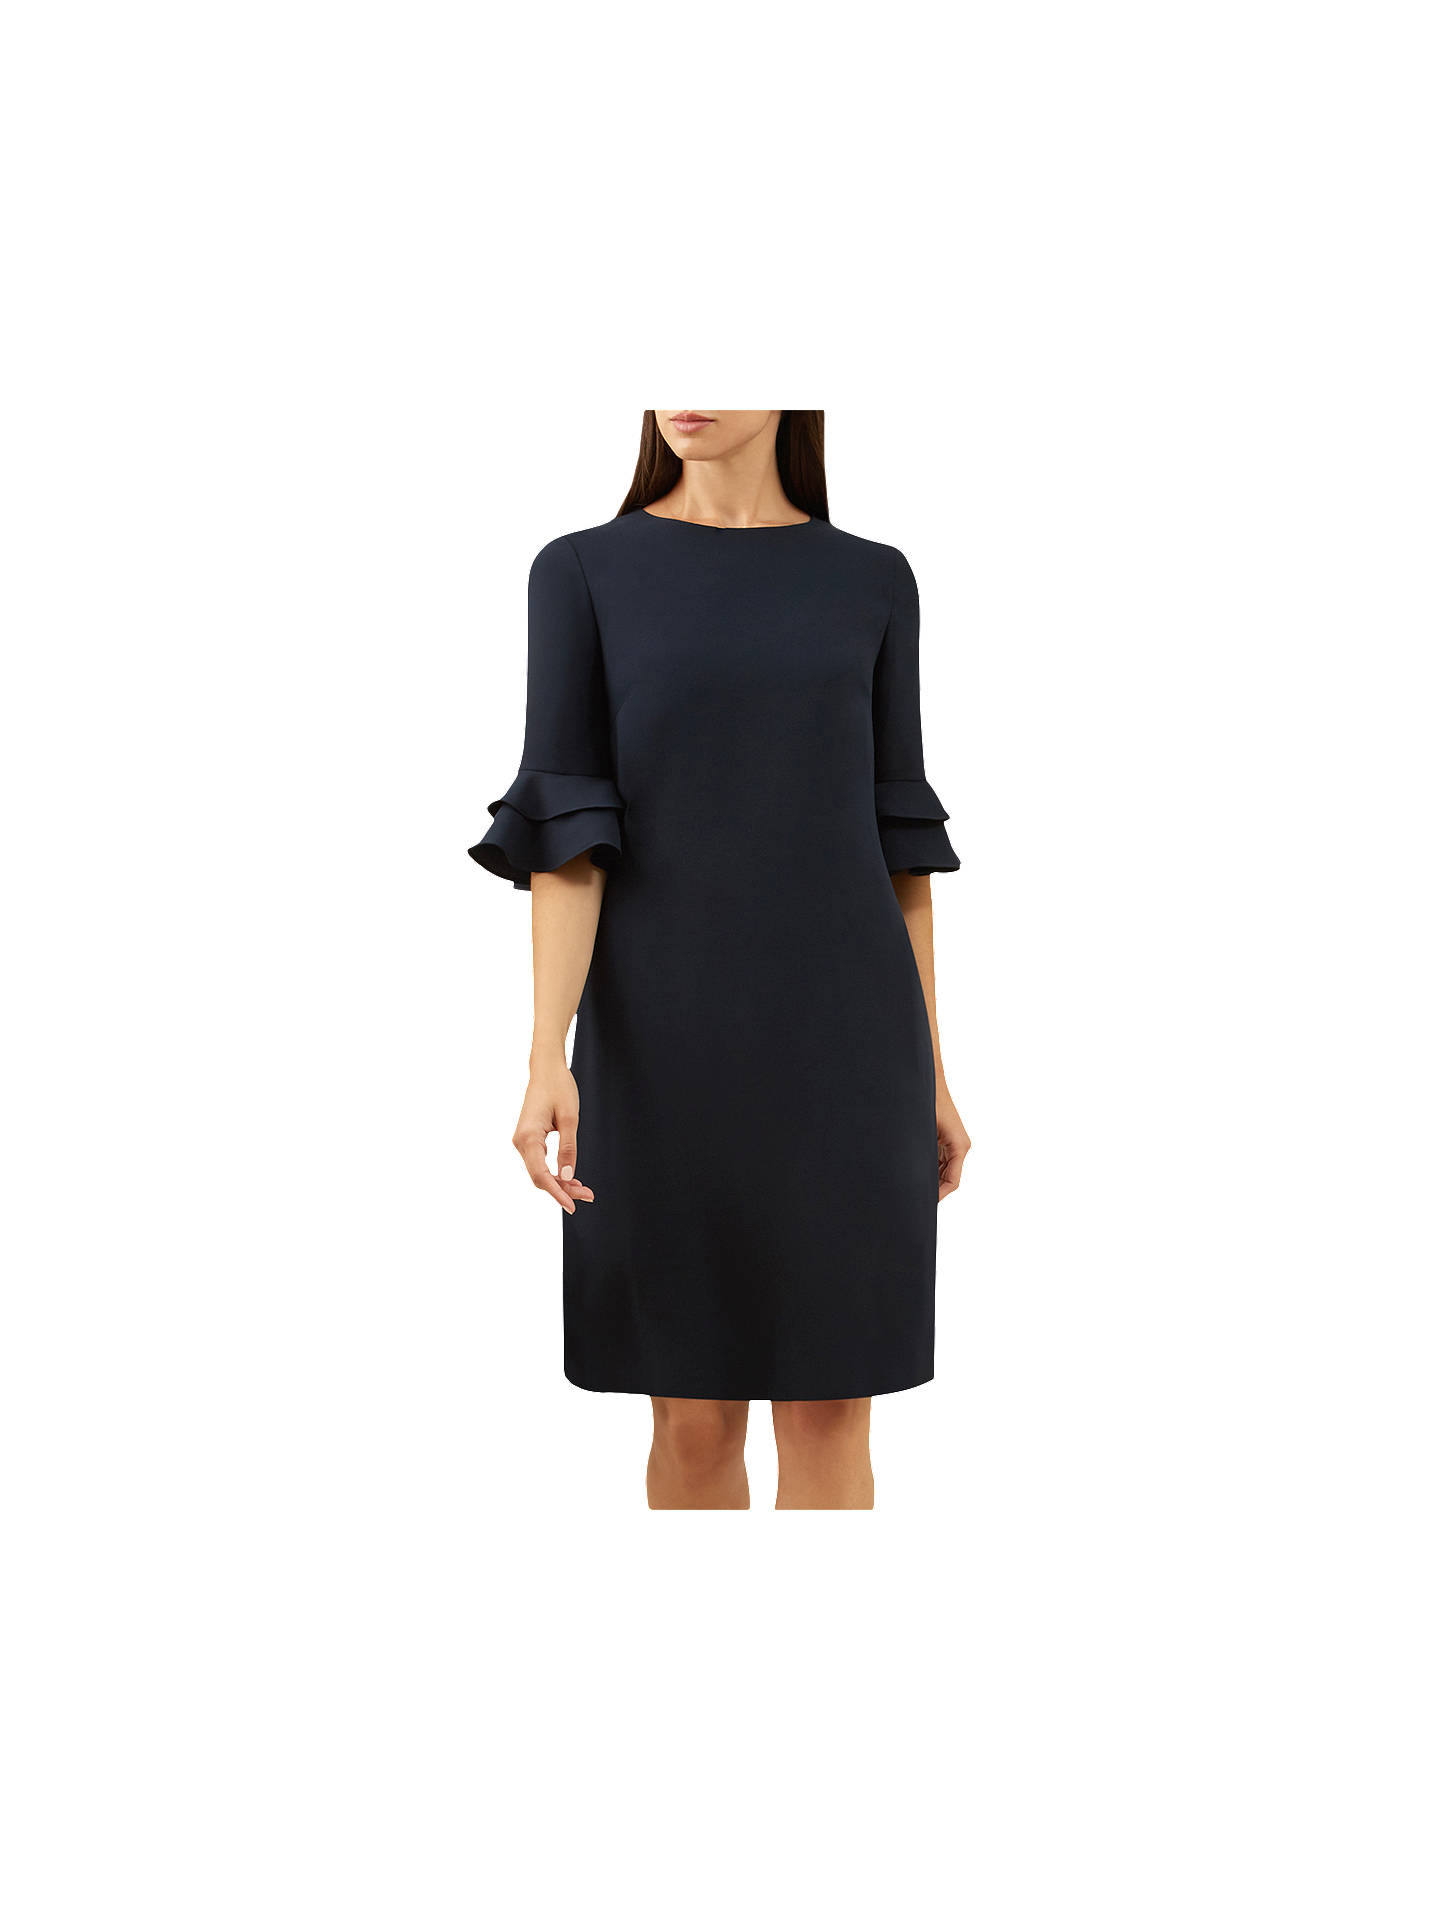 928220b18e912 Buy Hobbs Frances Dress, Navy, 6 Online at johnlewis.com ...